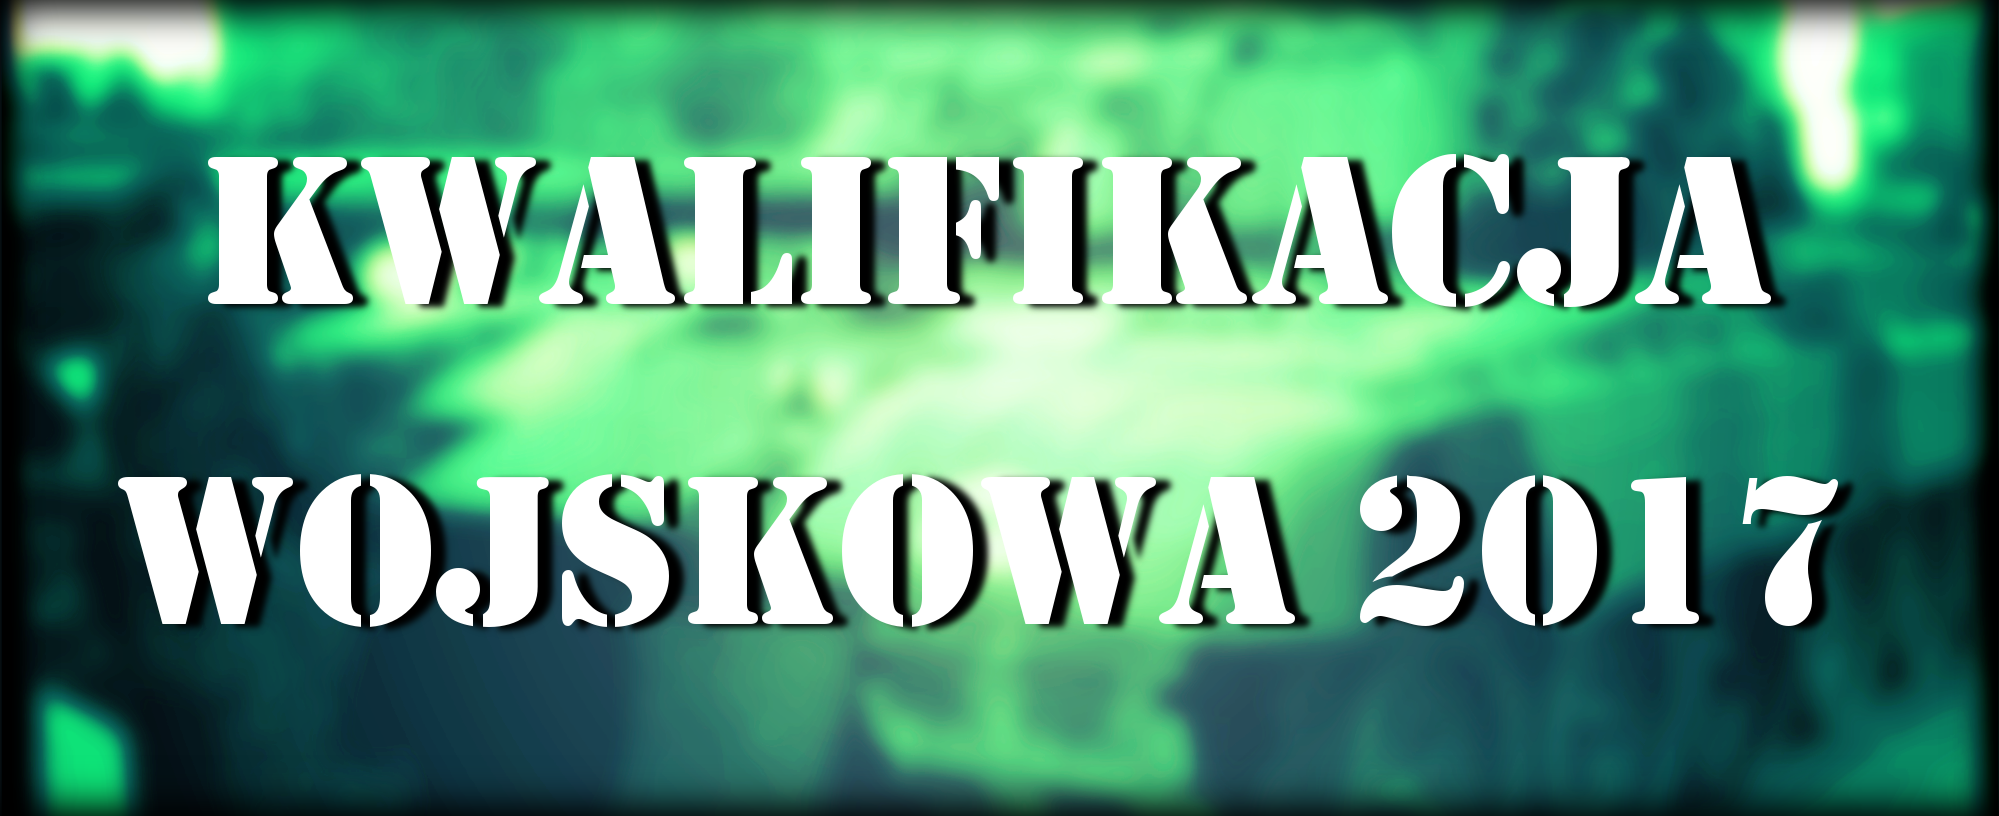 - kwalifikacja_wojskowa_2017.png